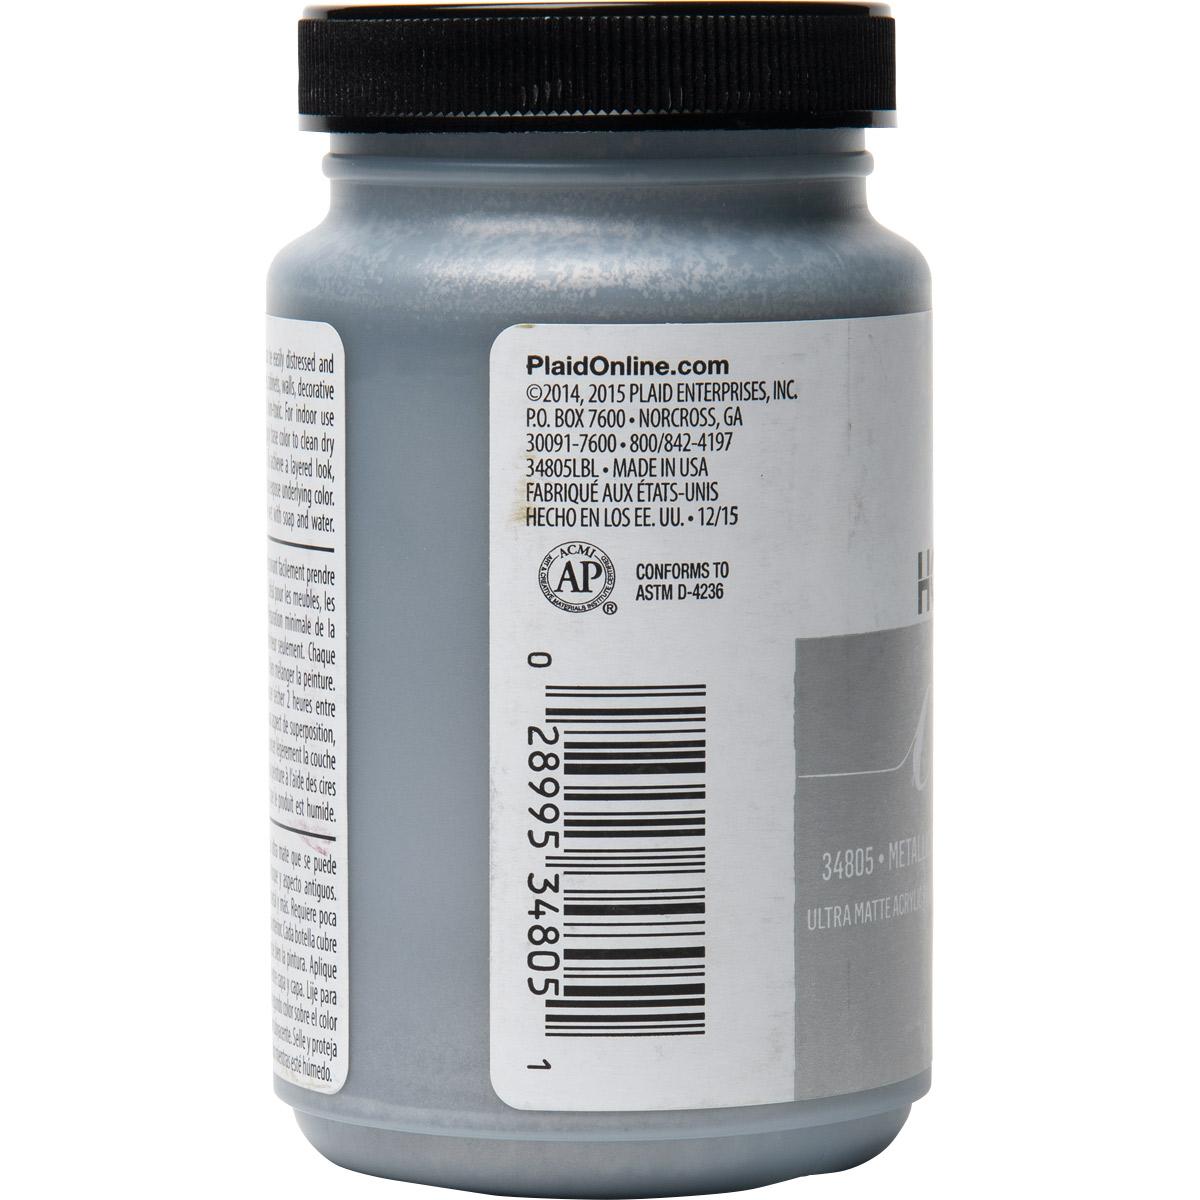 FolkArt ® Home Decor™ Chalk - Metallic Silver, 8 oz. - 34805